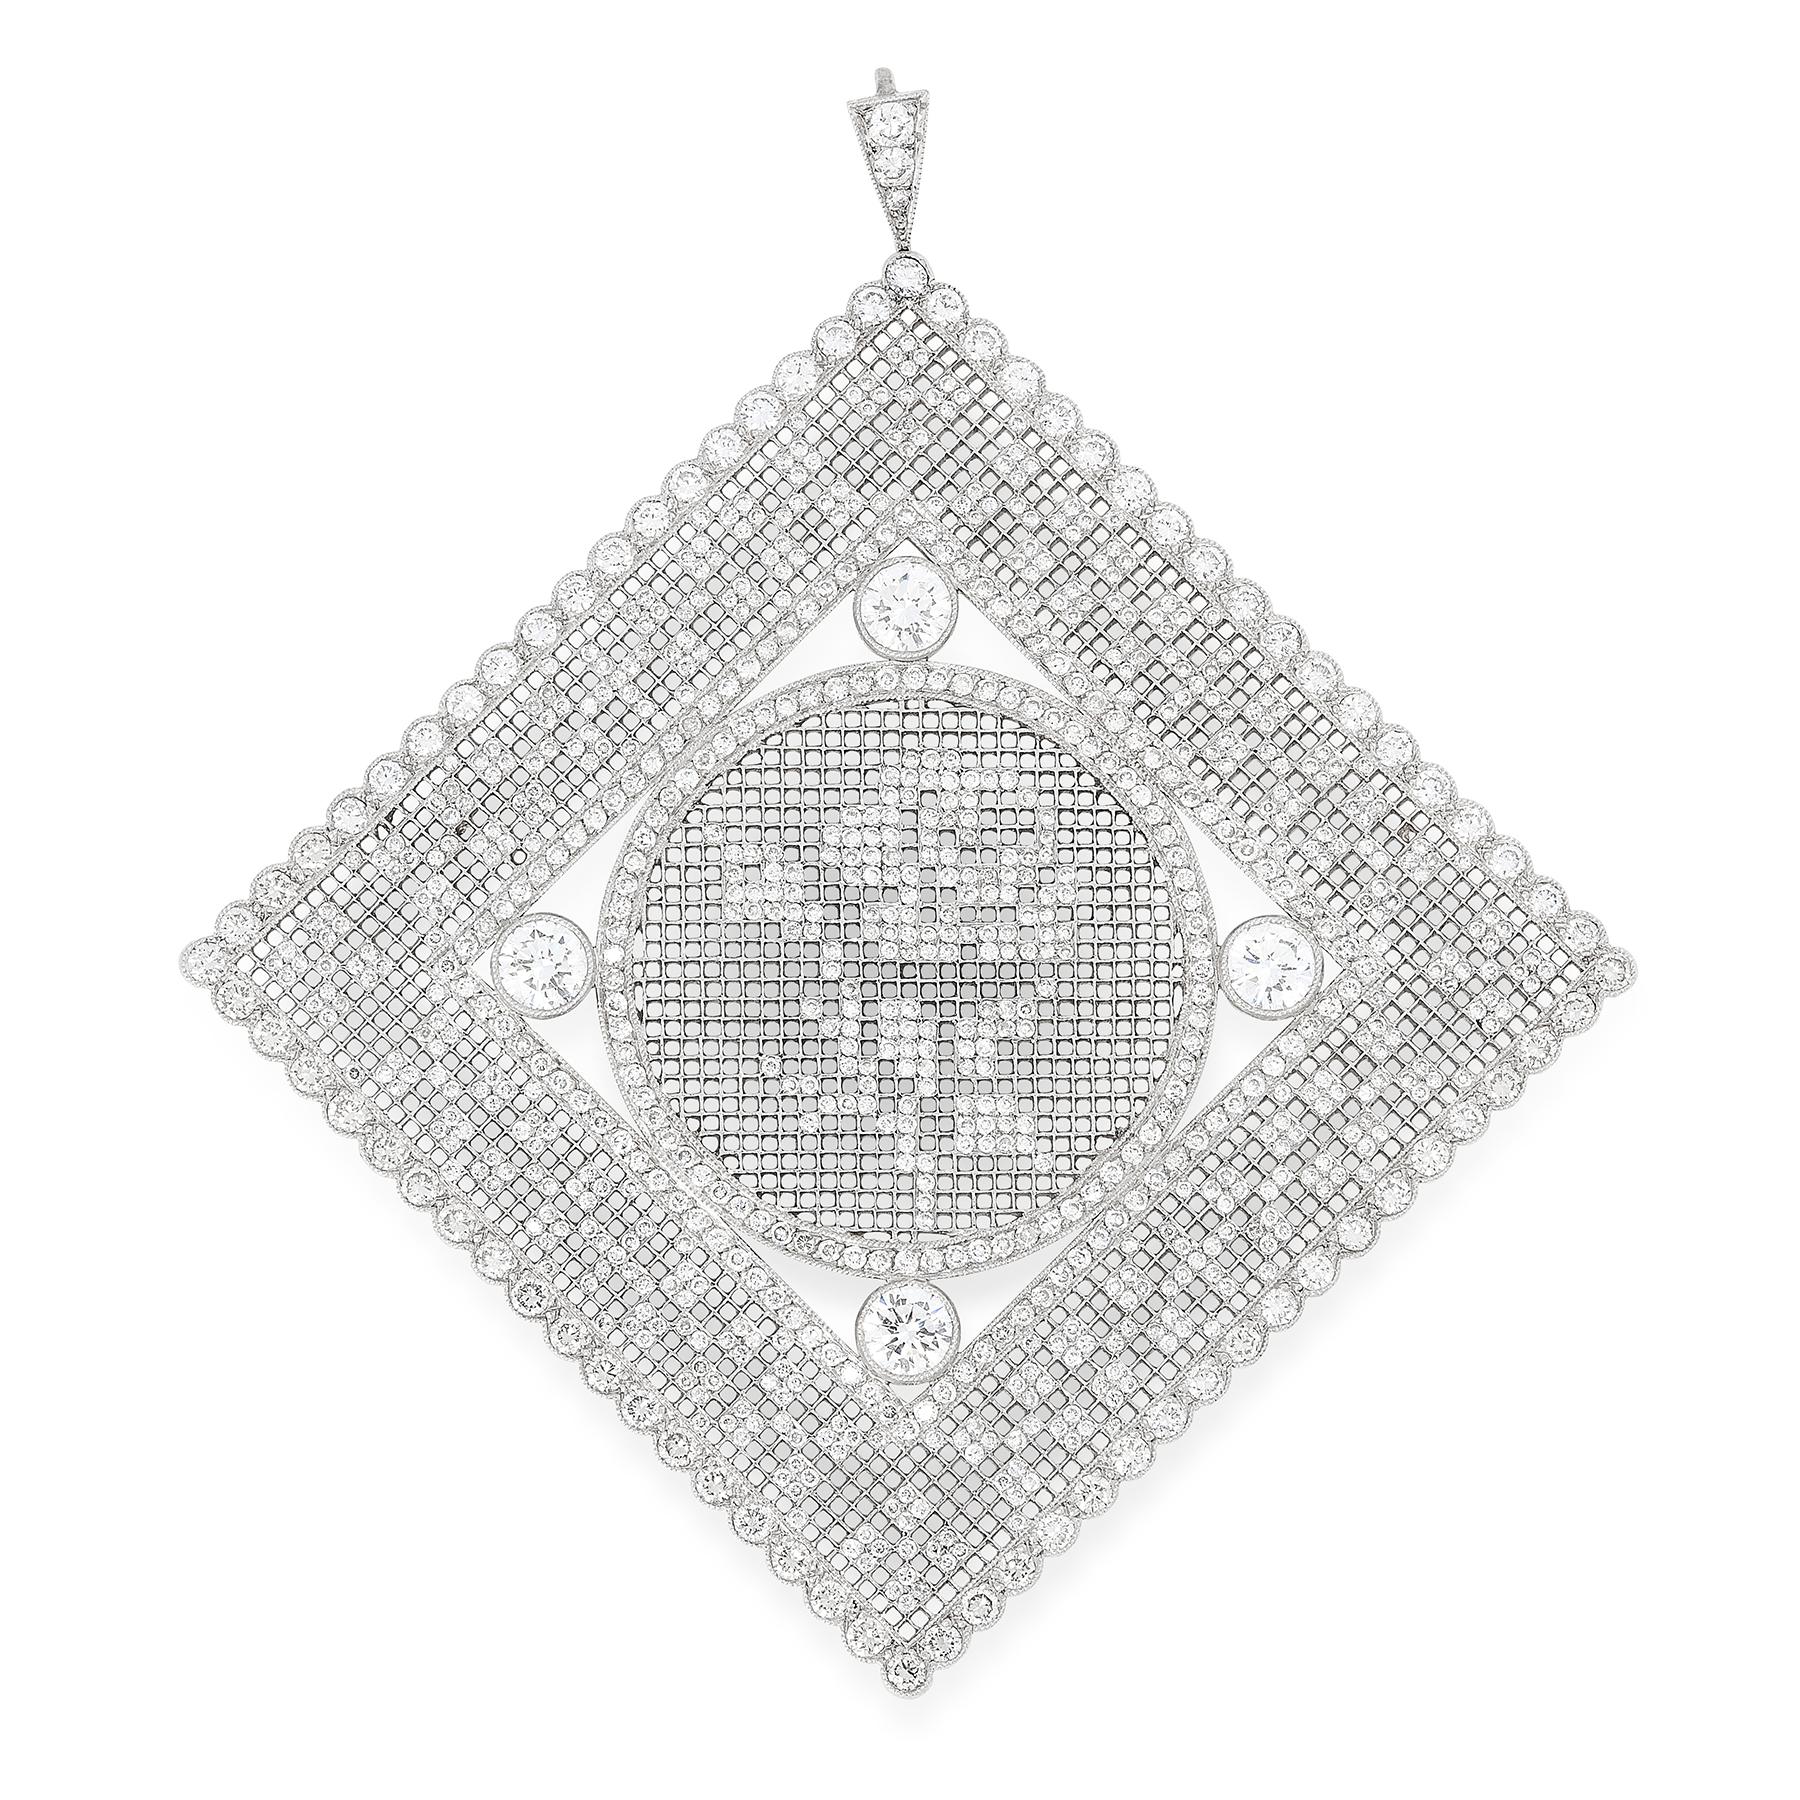 A DIAMOND PENDANT the large square body of lattice design inset with four principal round cut